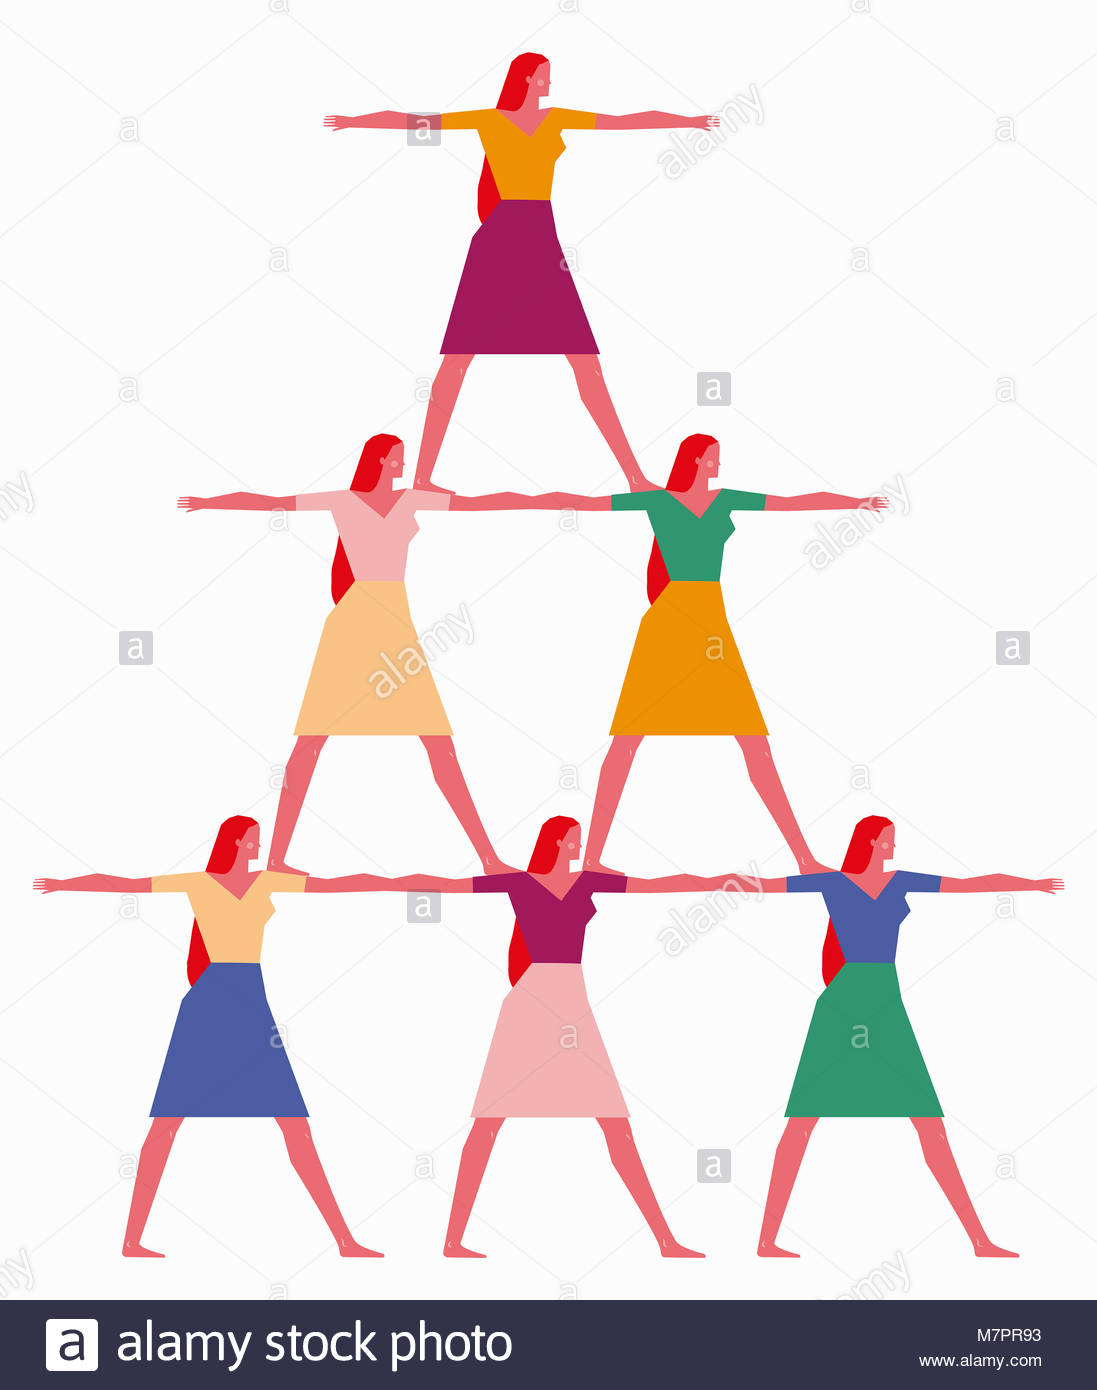 Les femmes formant pyramide humaine Banque D'Images